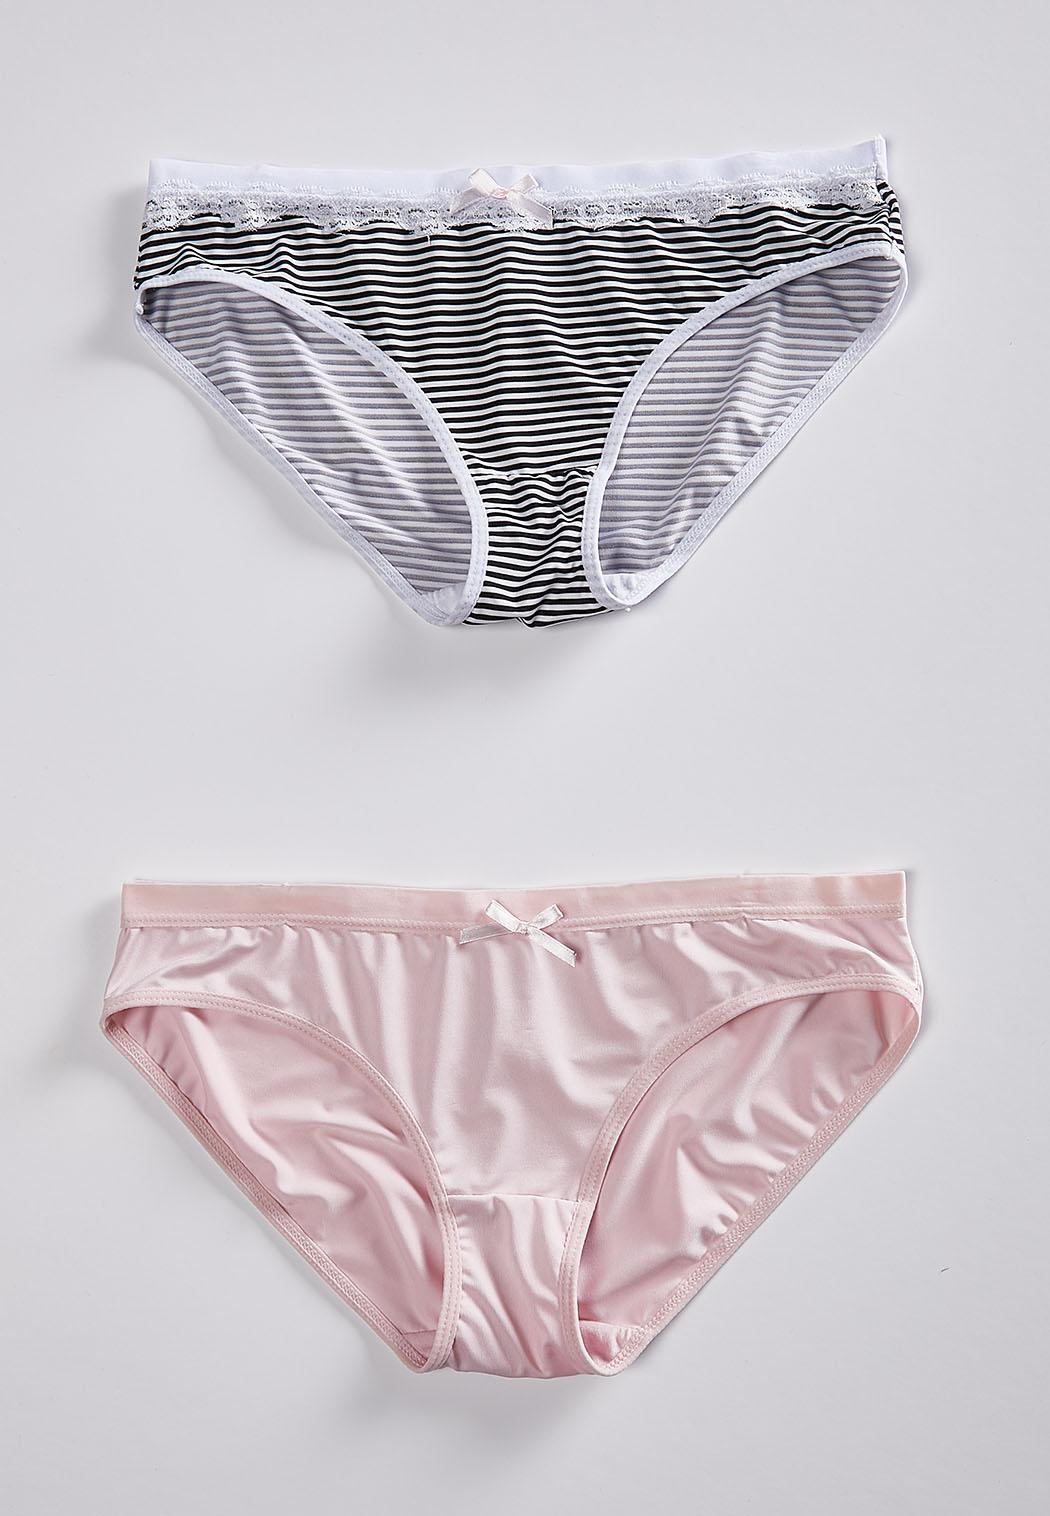 ab30e2f835 Plus Size Stripe And Soft Pink Panty Set Panties Cato Fashions